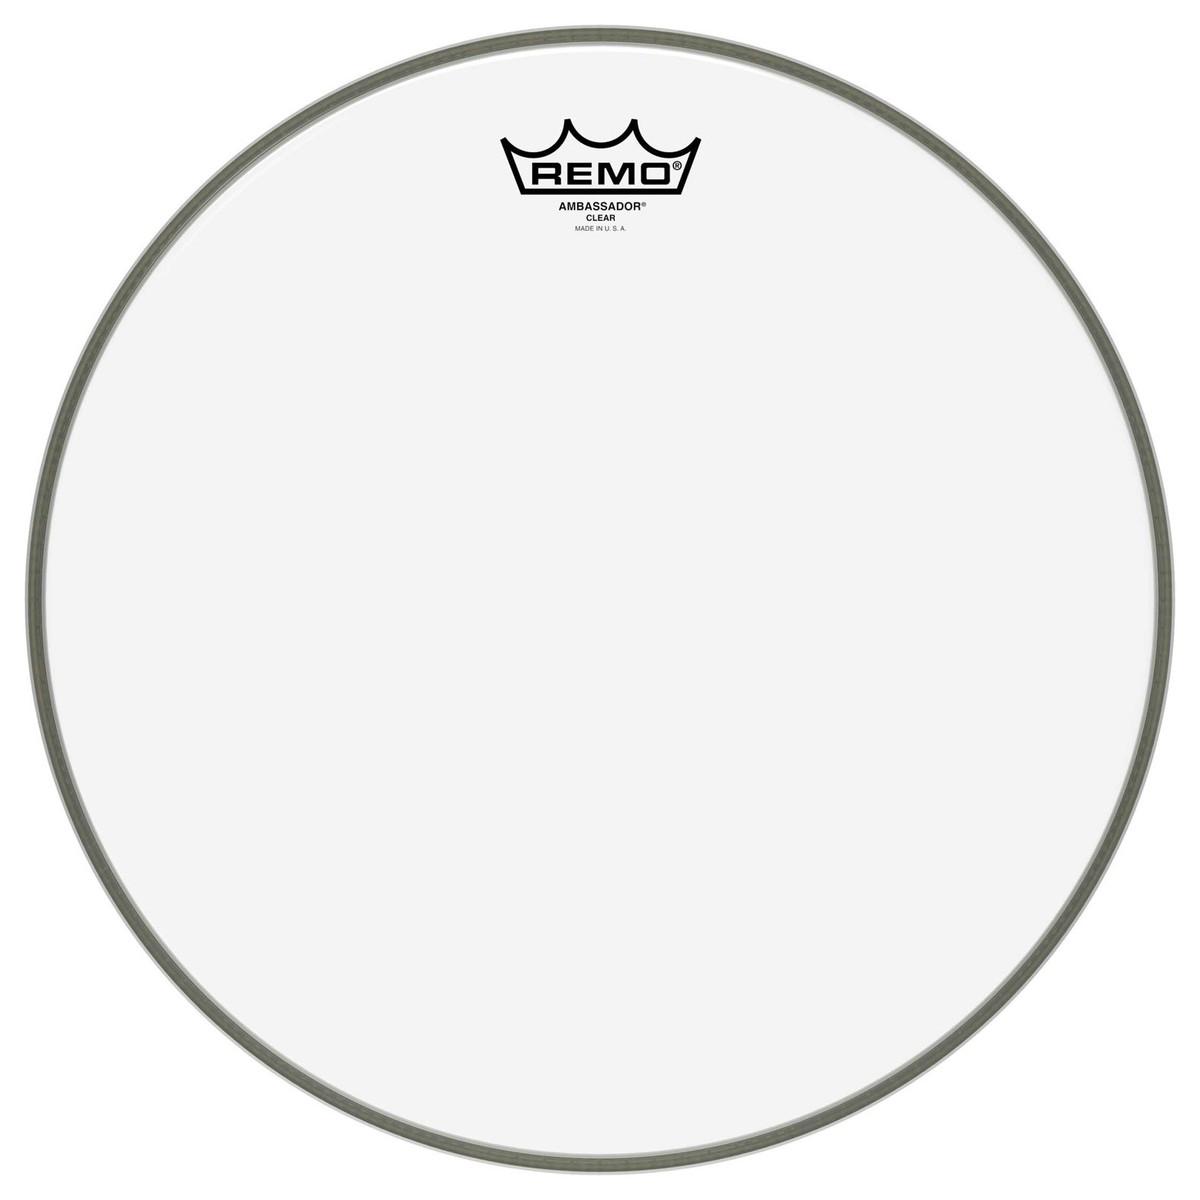 Remo Ambassador Clear 14 Drum Head